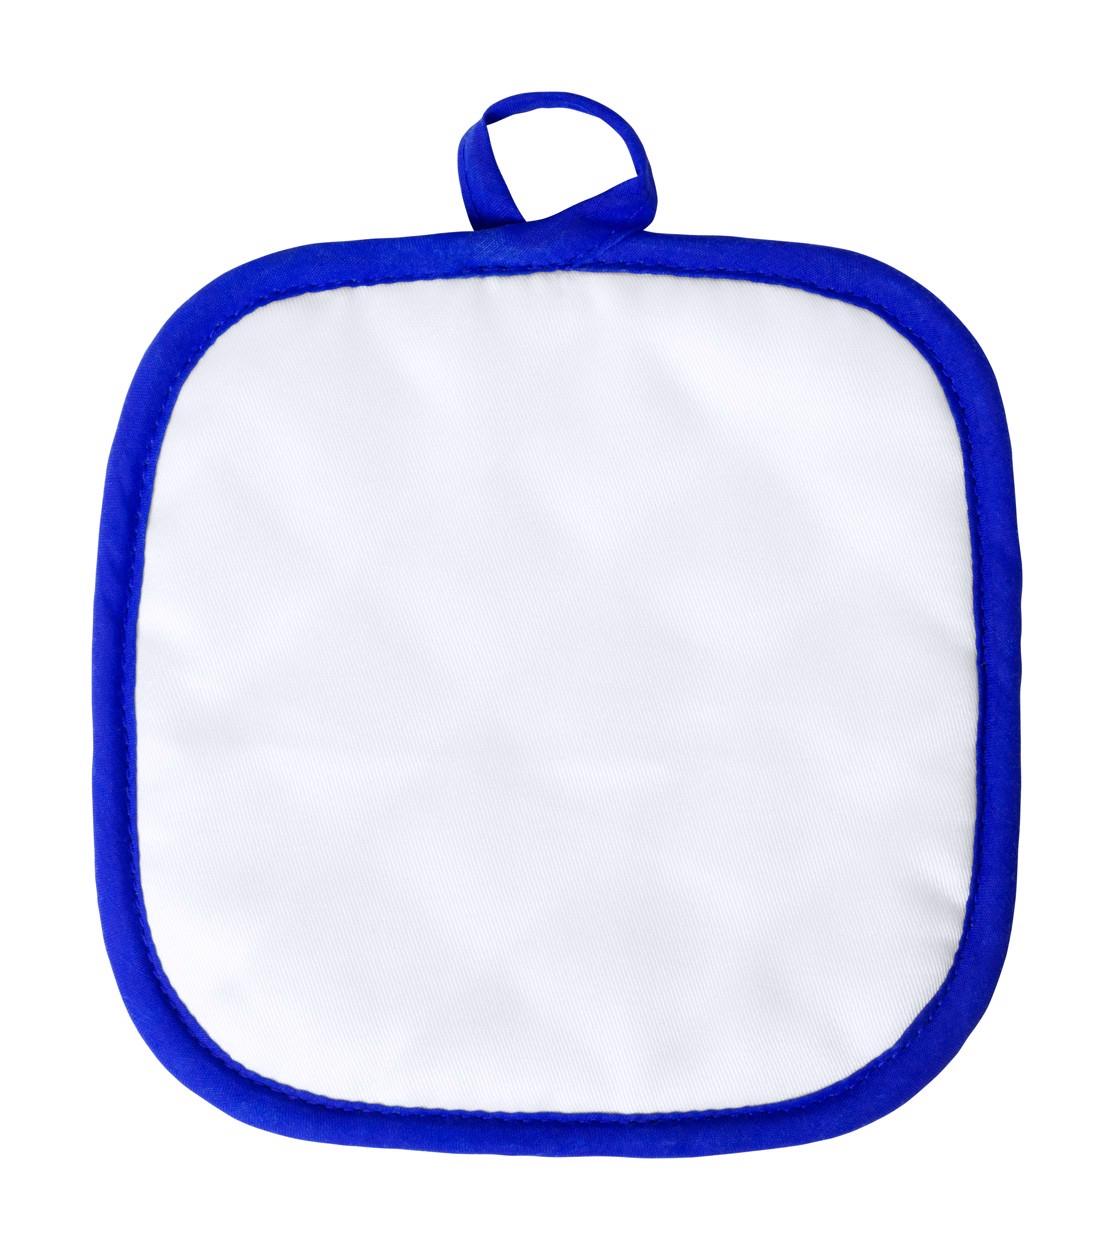 Kuchyňská Chňapka Kalmont - Bílá / Modrá